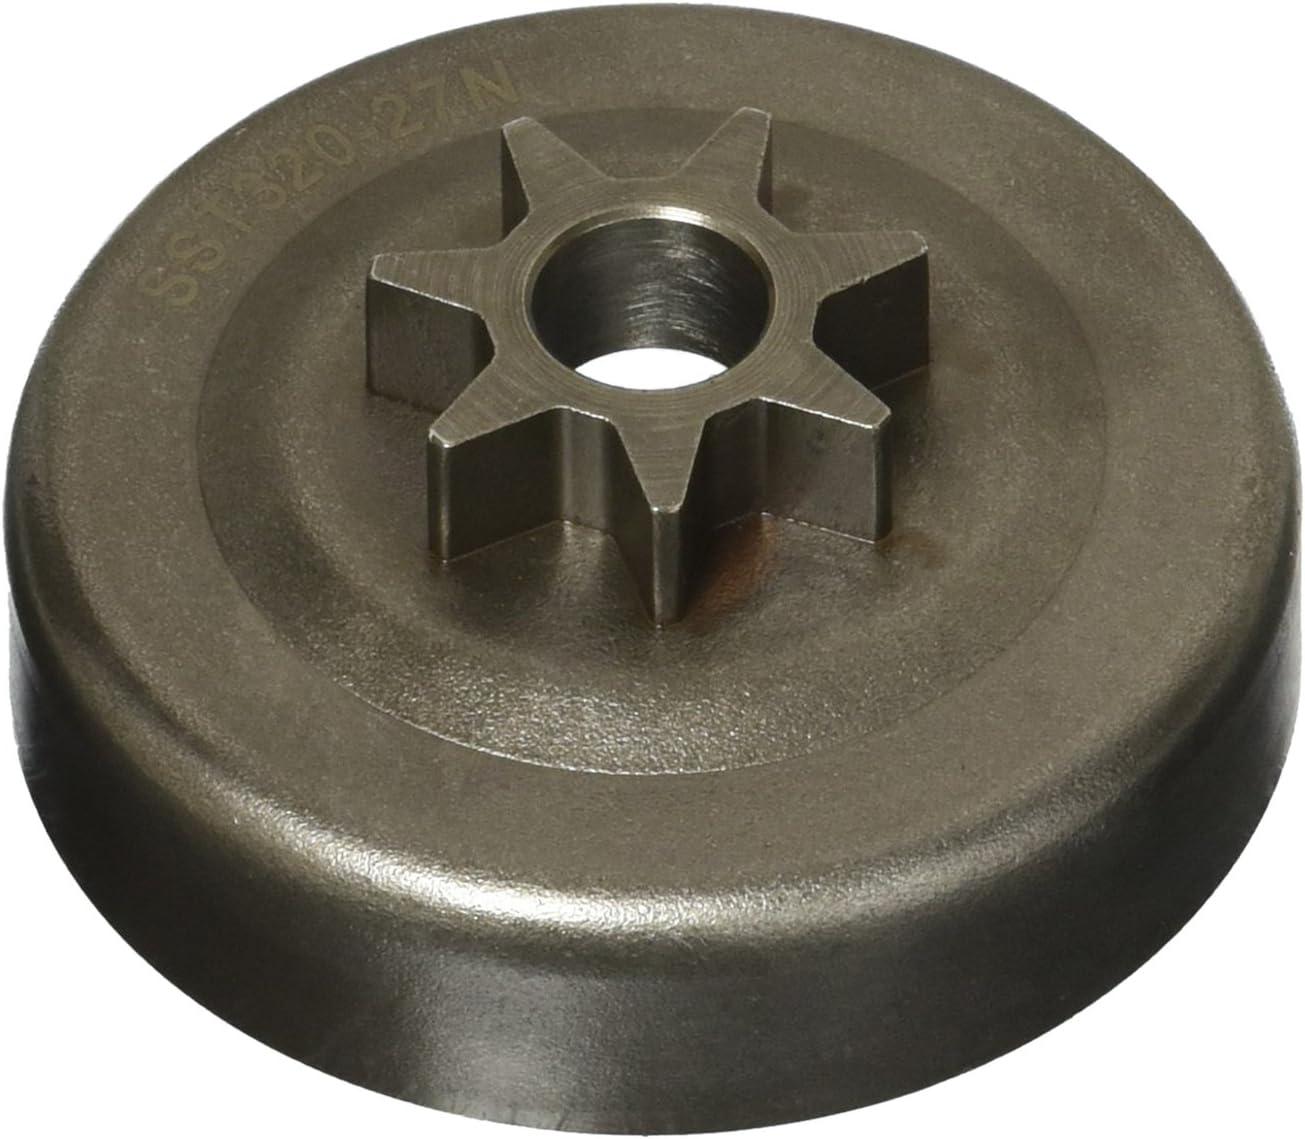 Clutch Drum Sprocket For Echo CS300 CS301 CS340 CS341 Chainsaw Outdoor Equipment